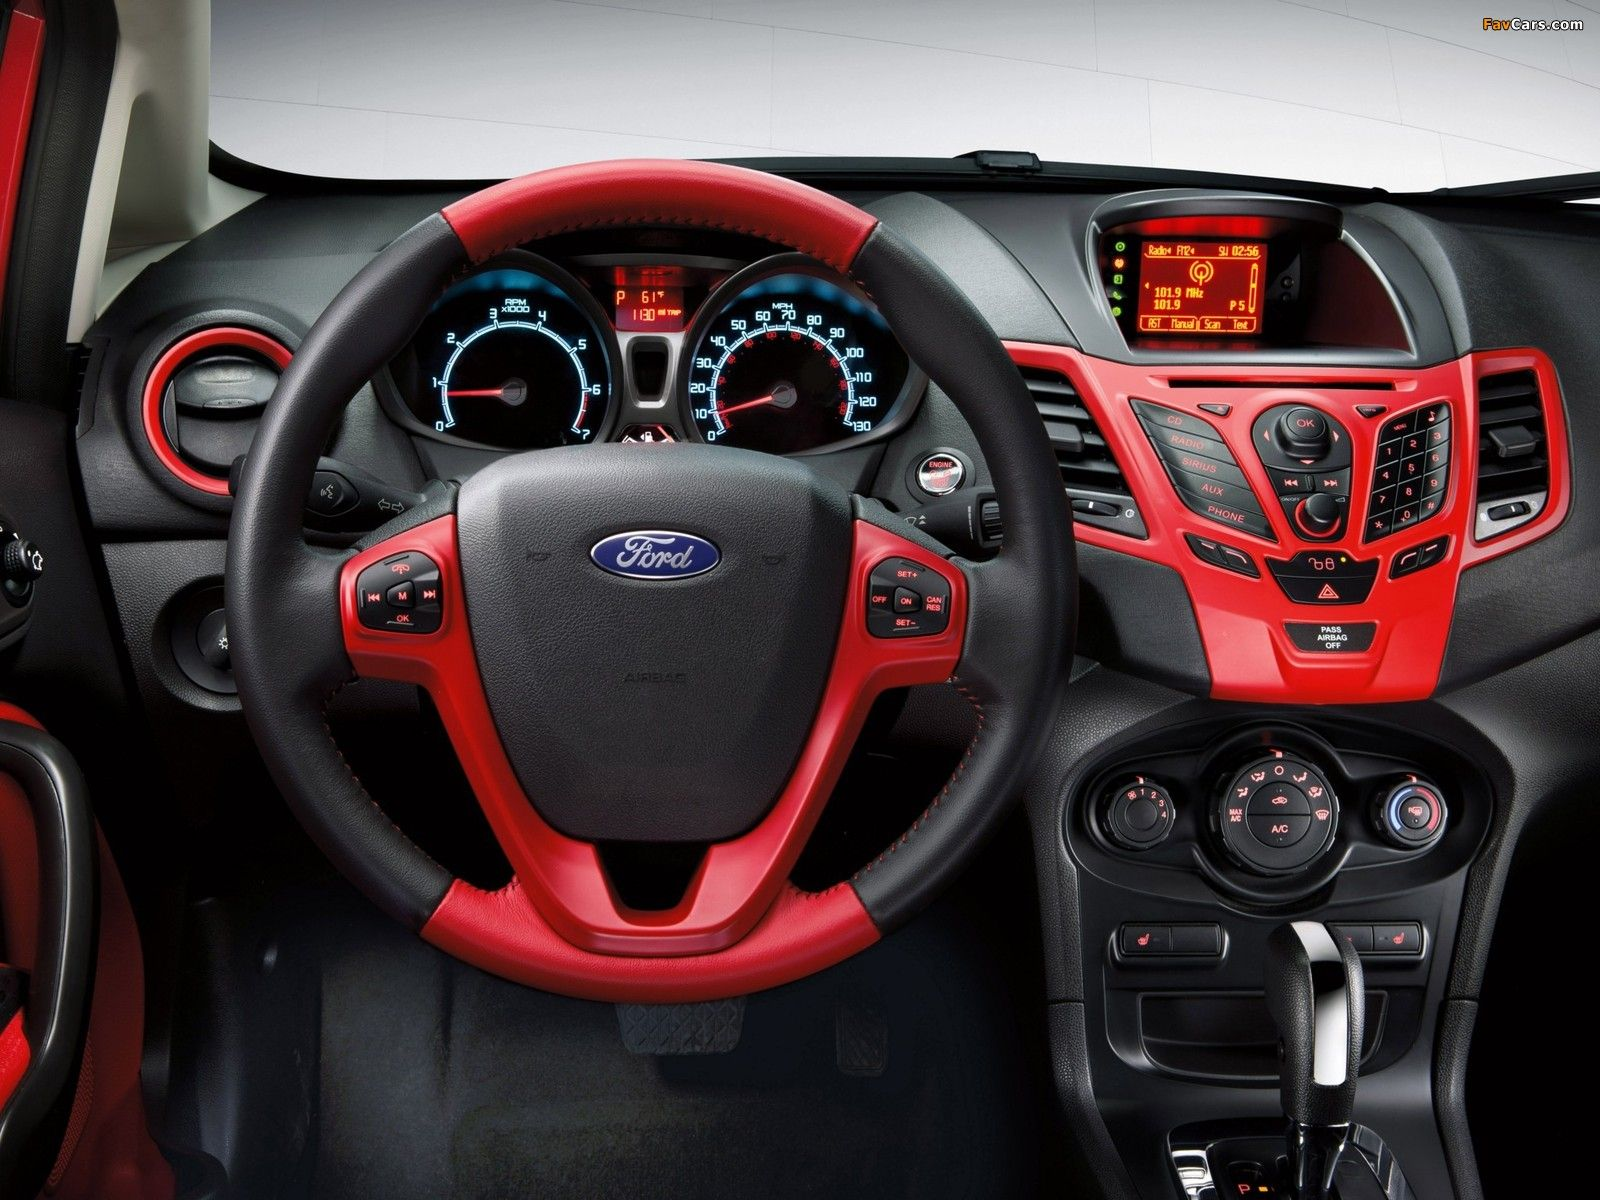 Ford Fiesta Hatchback Personalization Package 2011 Ford Fiesta Modified Ford Fiesta Ford Ranger Interior